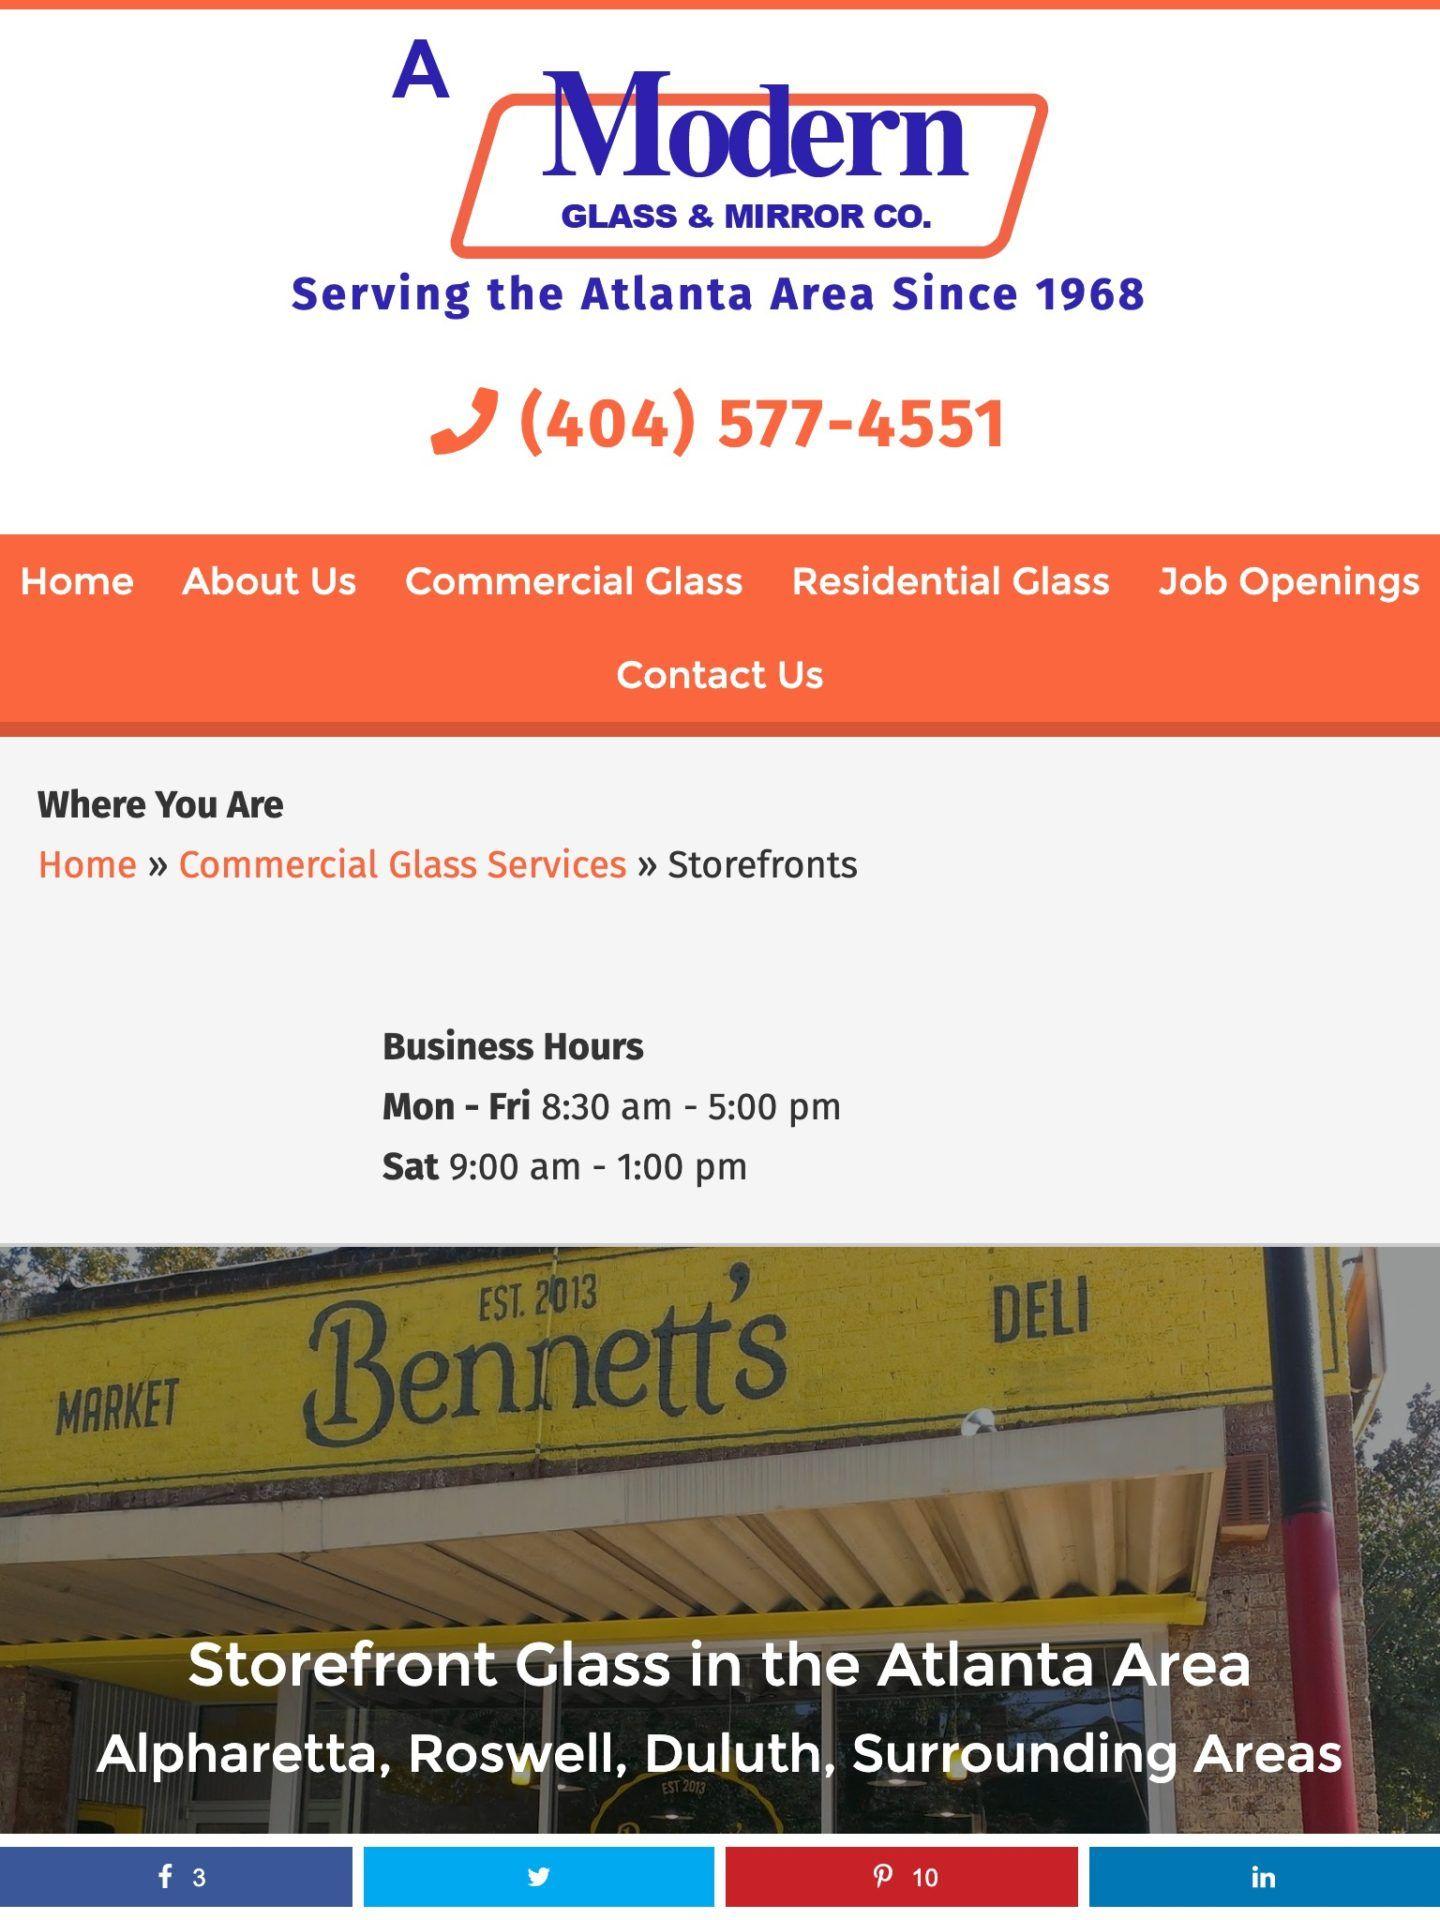 A Modern Glass (Atlanta, GA) Tablet Web Design